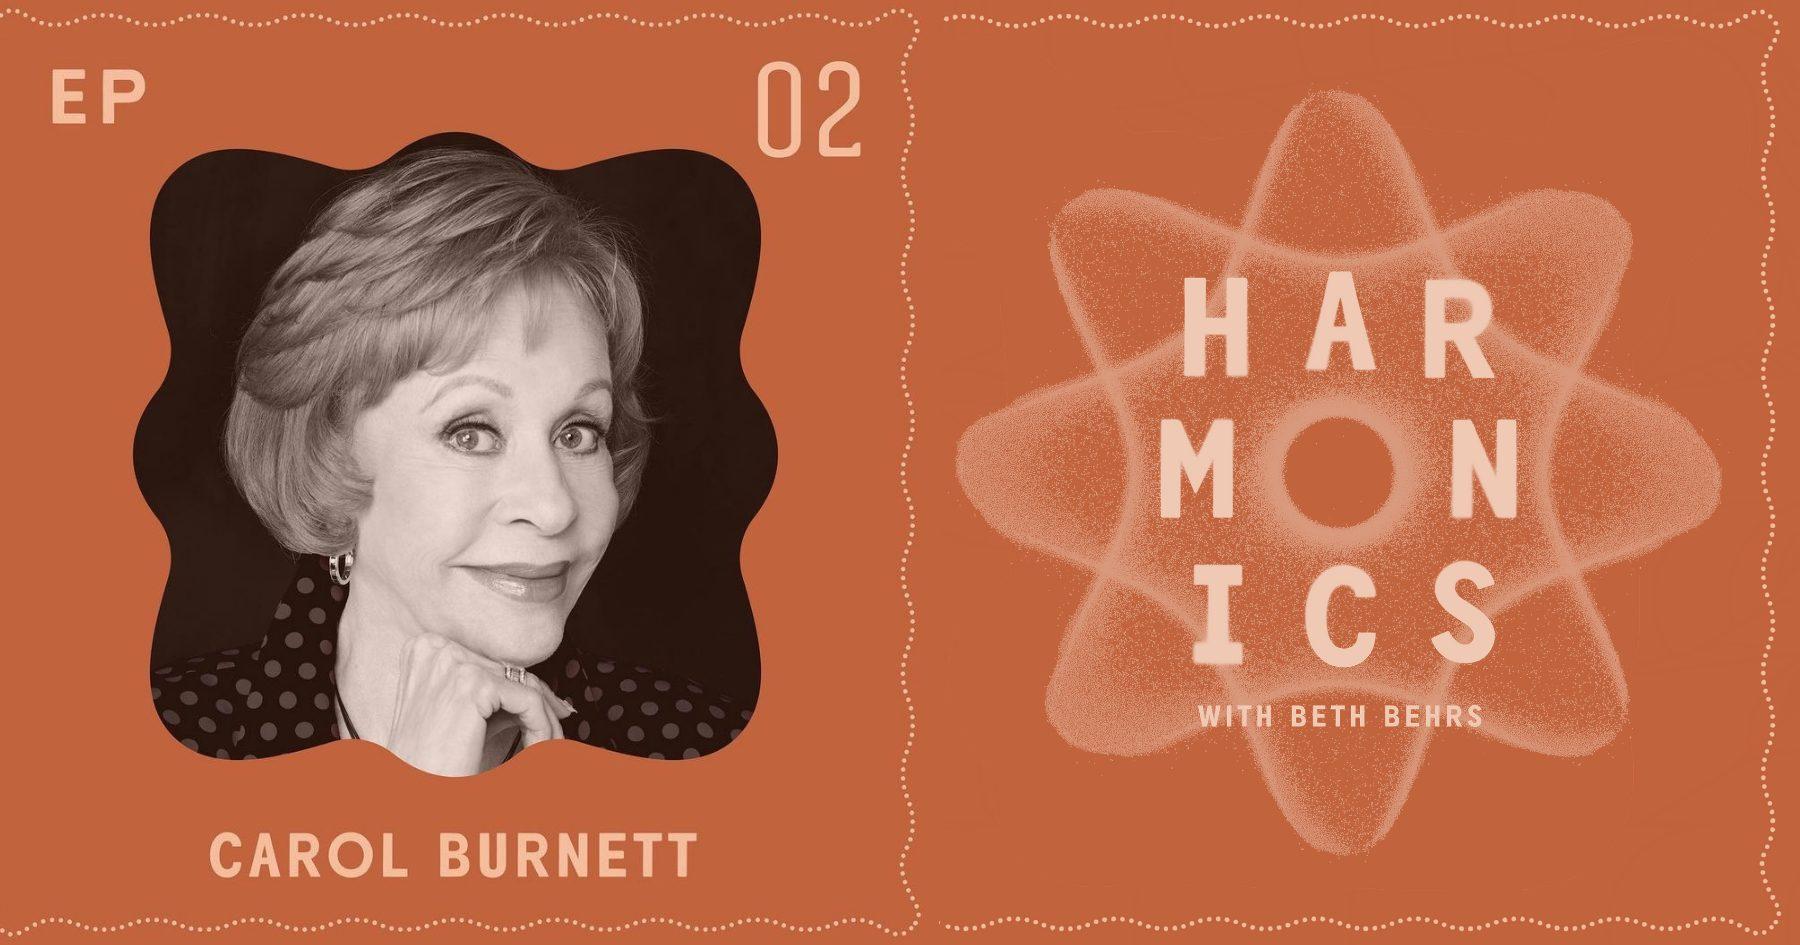 Harmonics with Beth Behrs: Carol Burnett